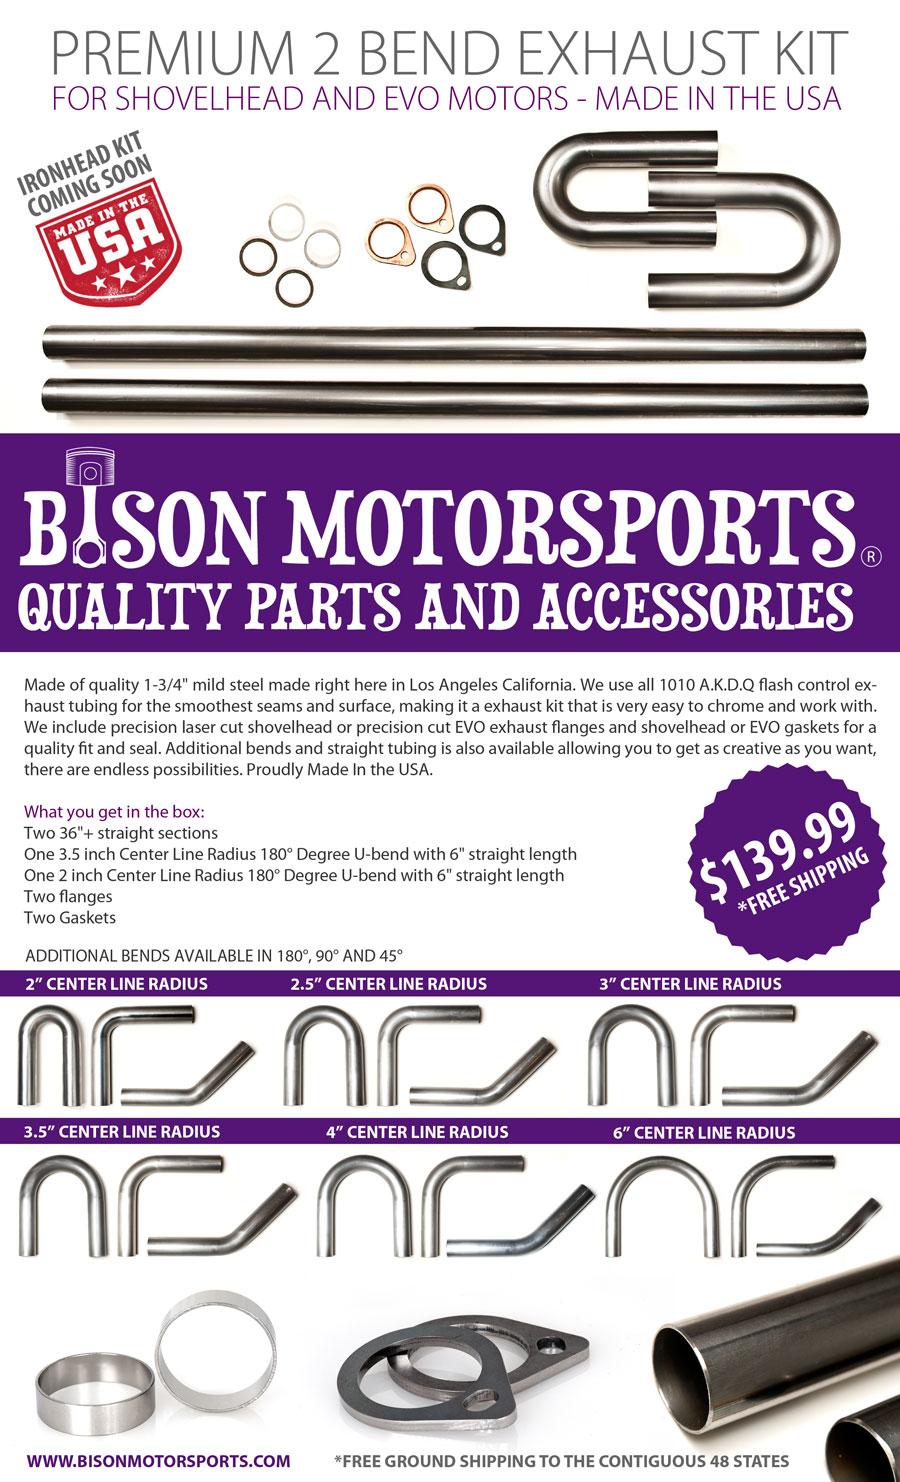 ChopCult: Bison Motorsports Announces the Launch of Premium